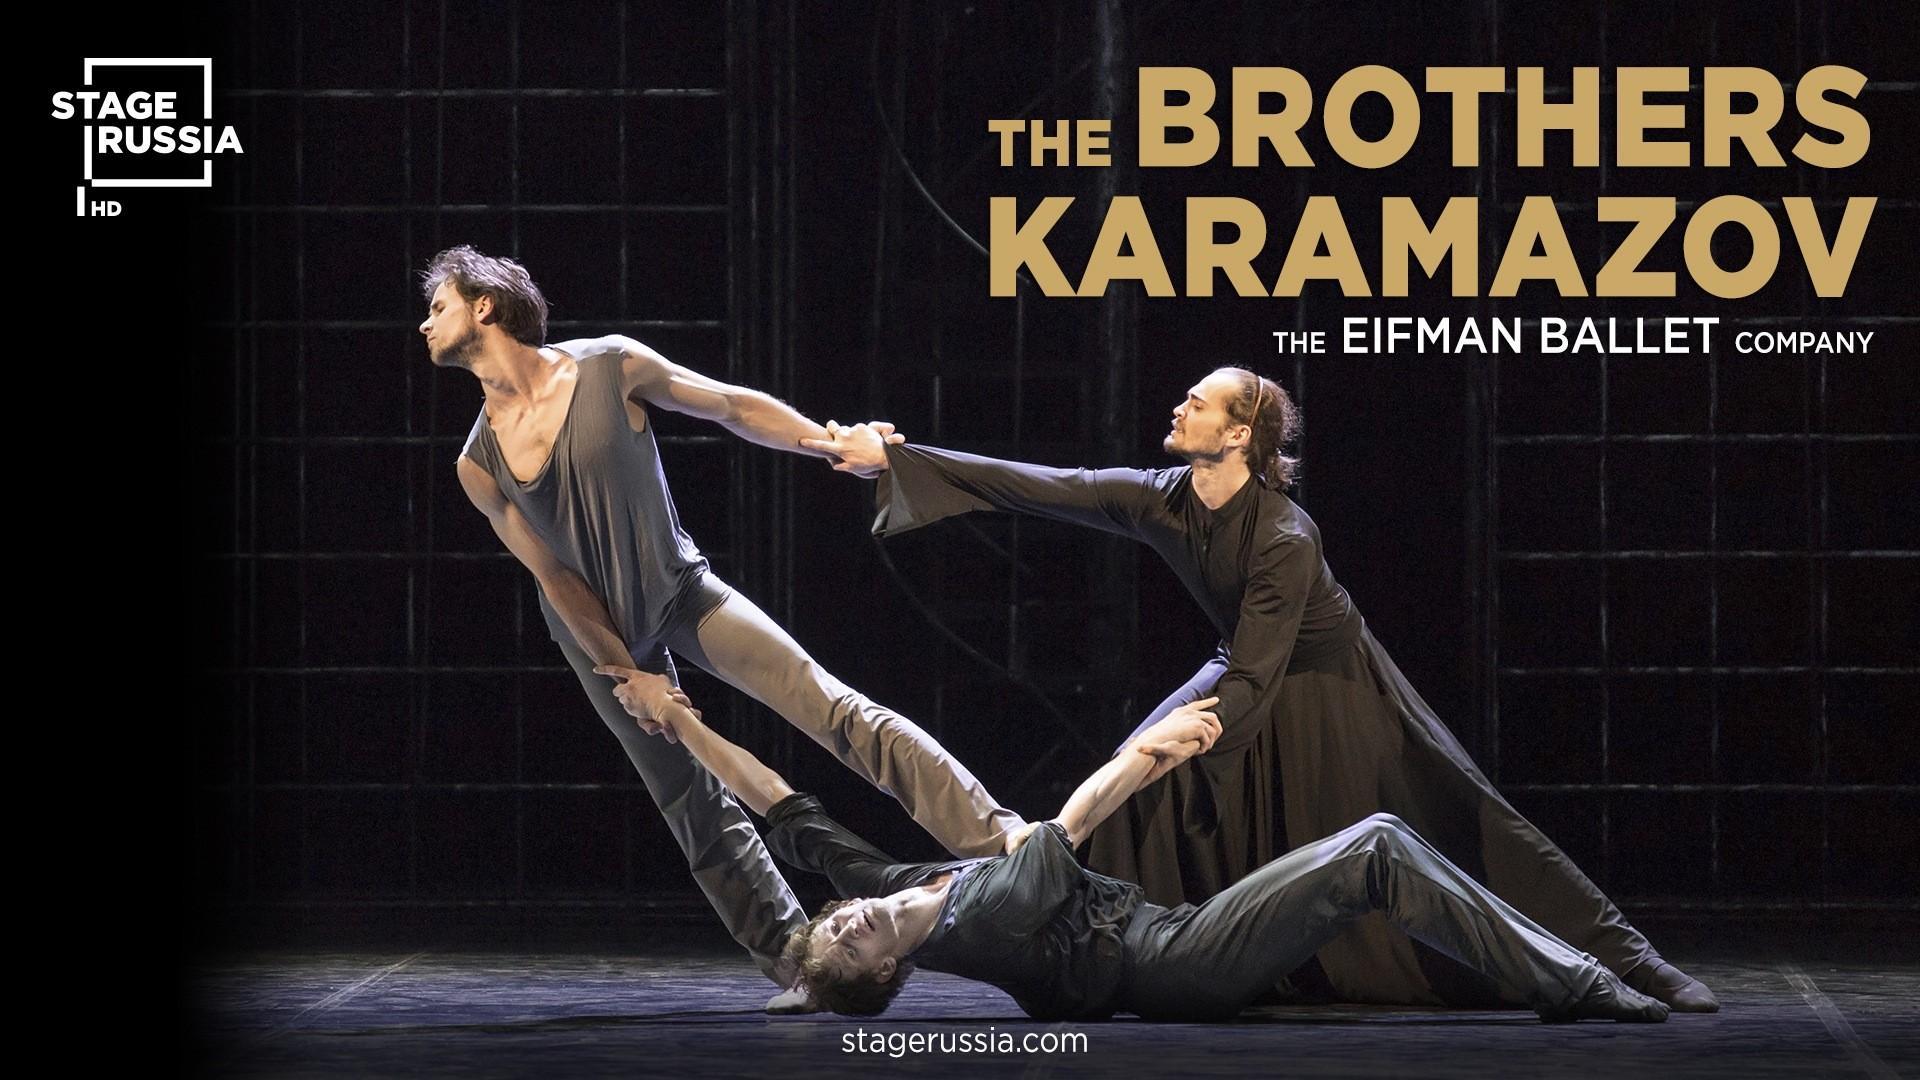 the_brothers_karamazov_web_horizontal_v2_1_compressed